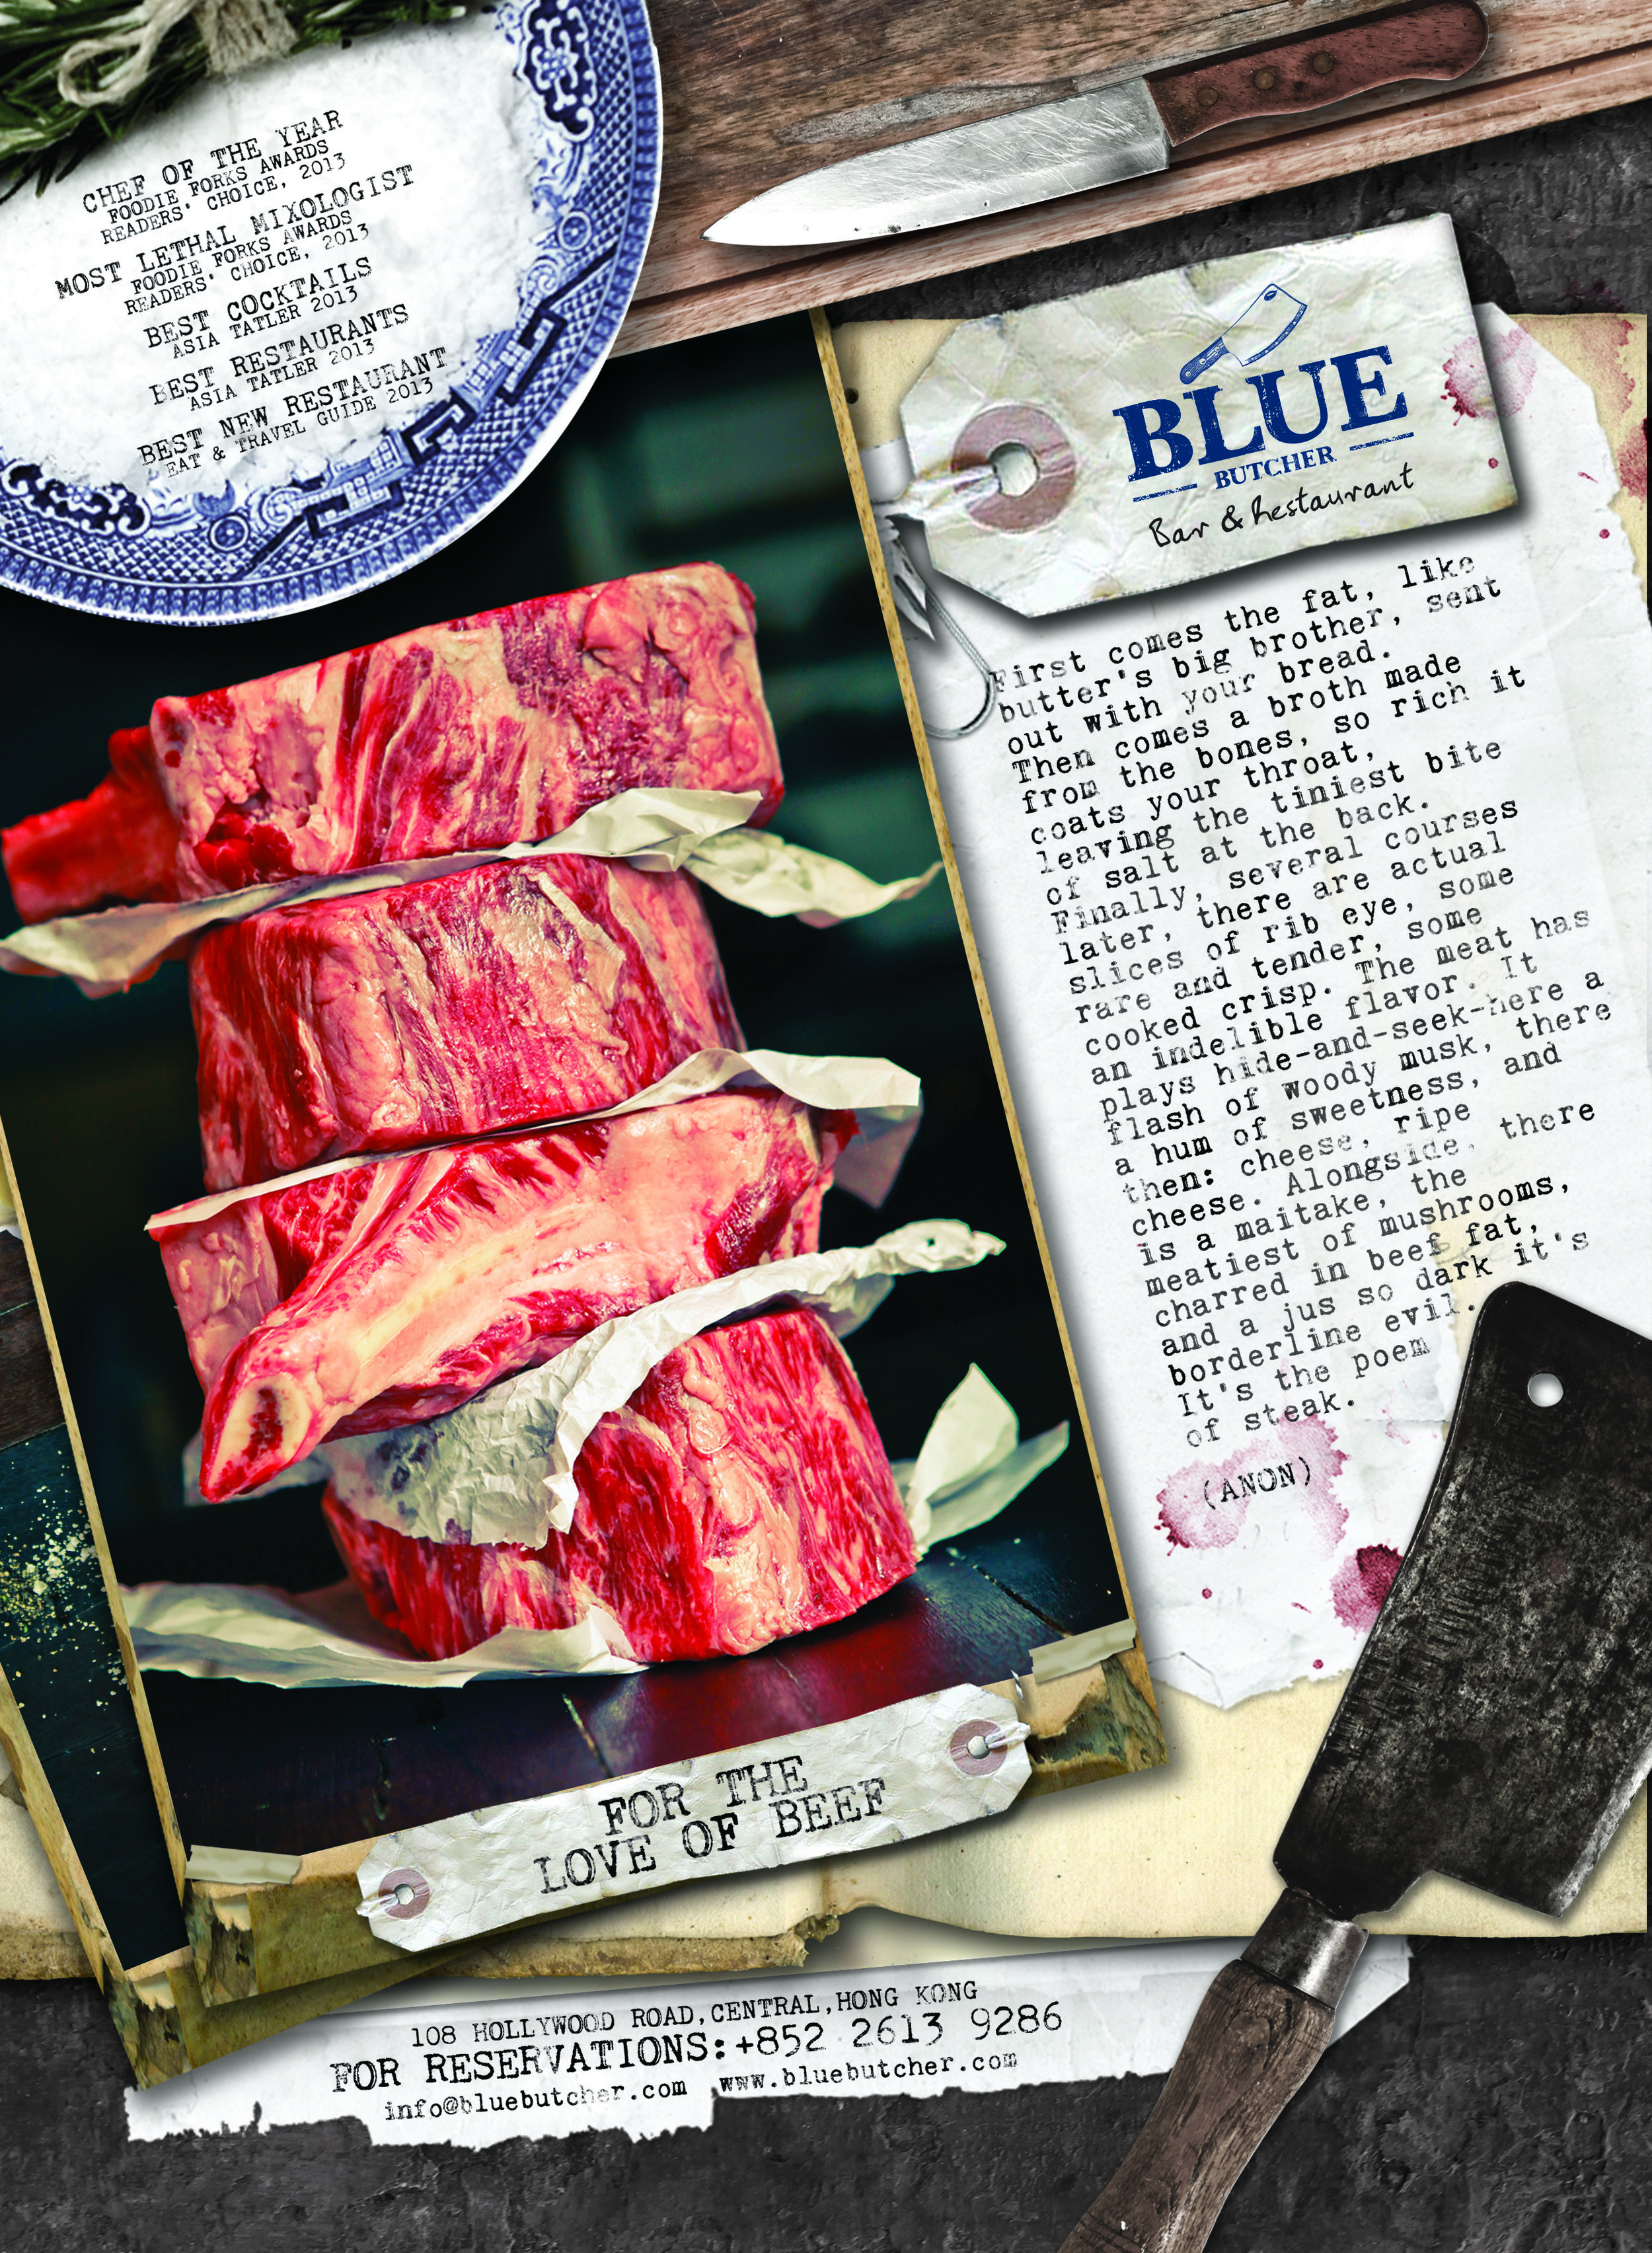 BLUE BUTCHER PRINT AD